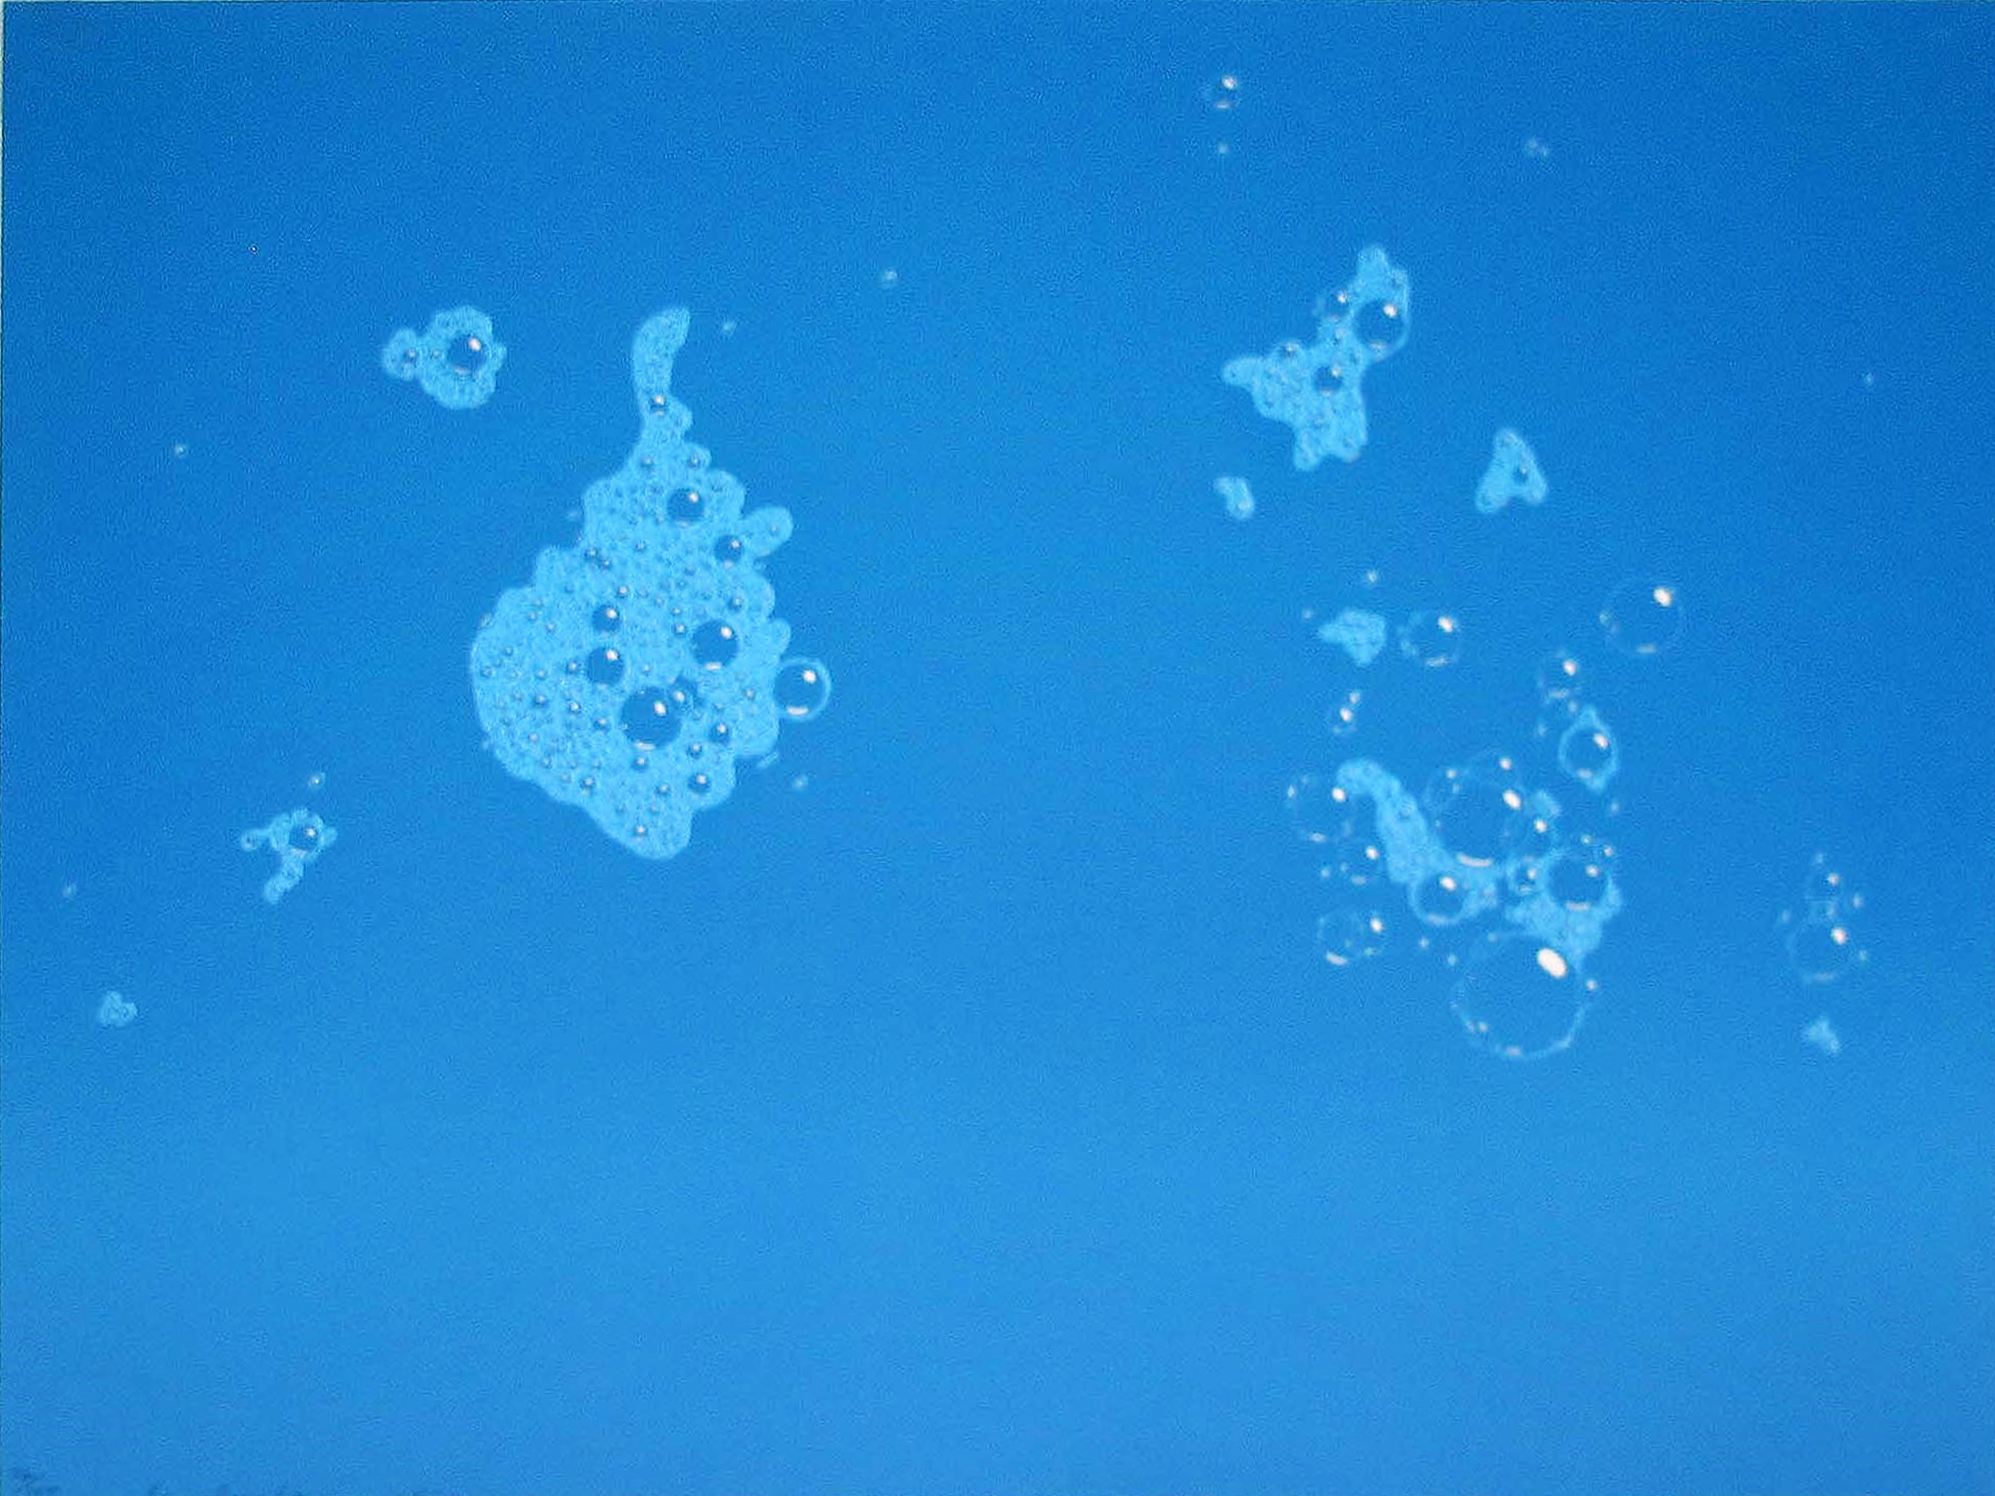 Blue Suds by Ed Ruscha